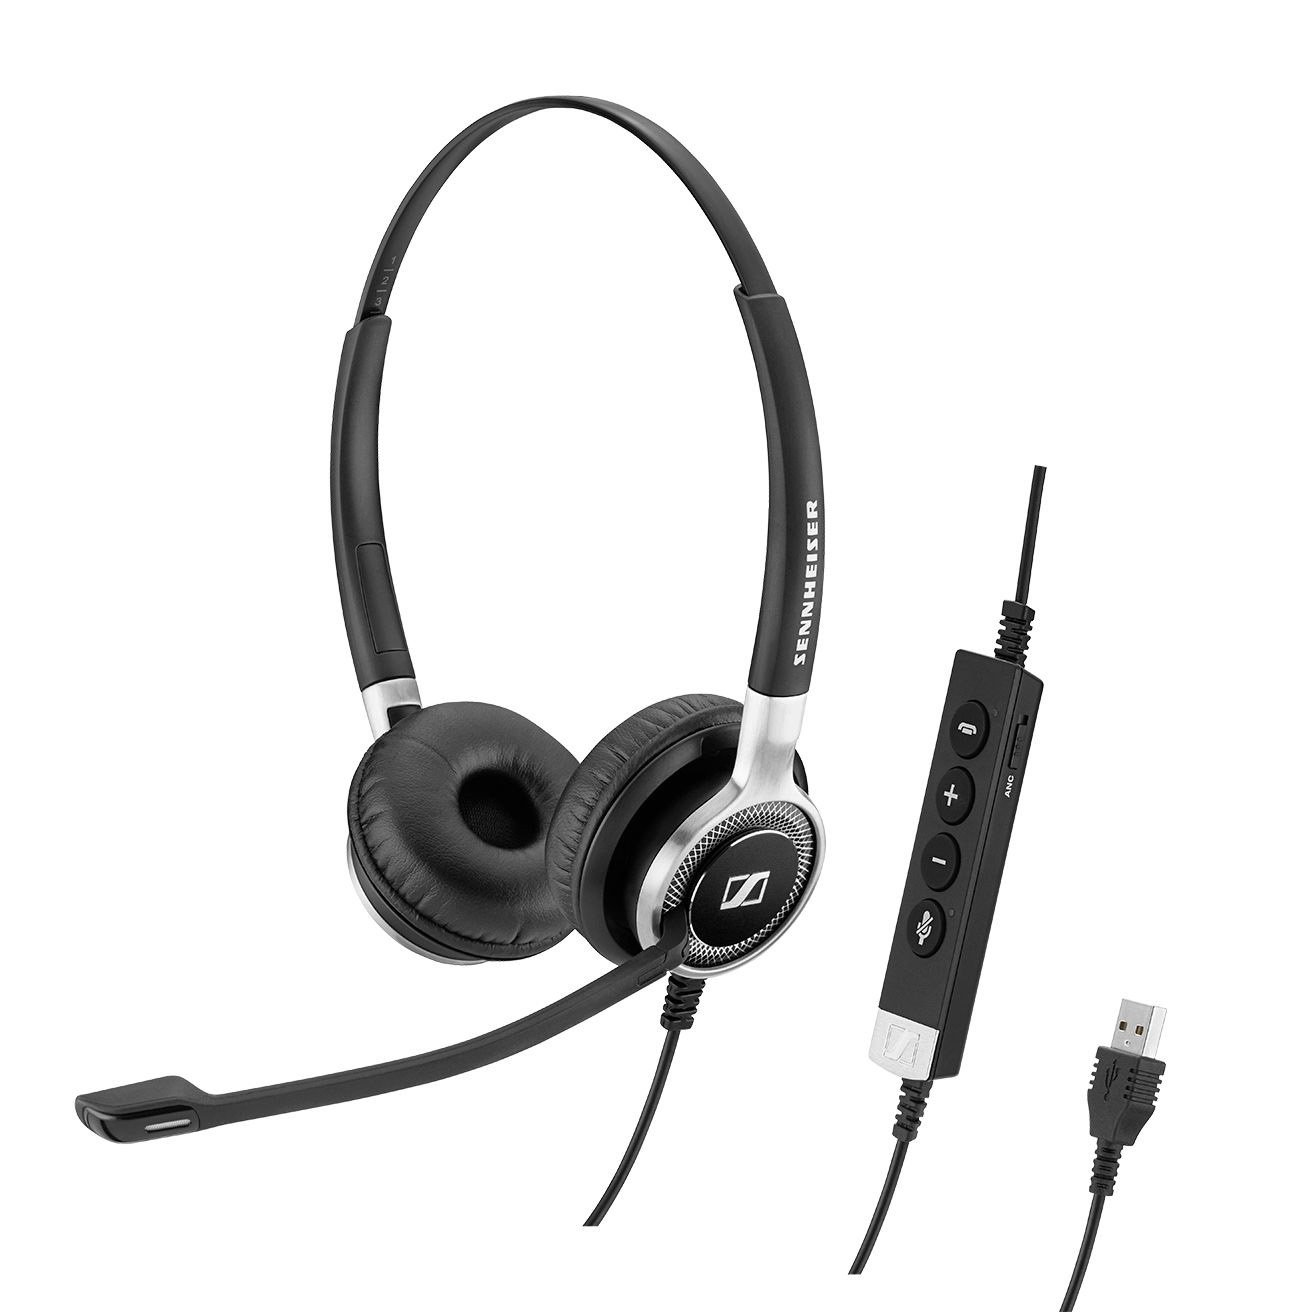 Sennheiser Century SC 660 ANC USB - Headset - on-ear - wired - active noise cancelling - USB - black